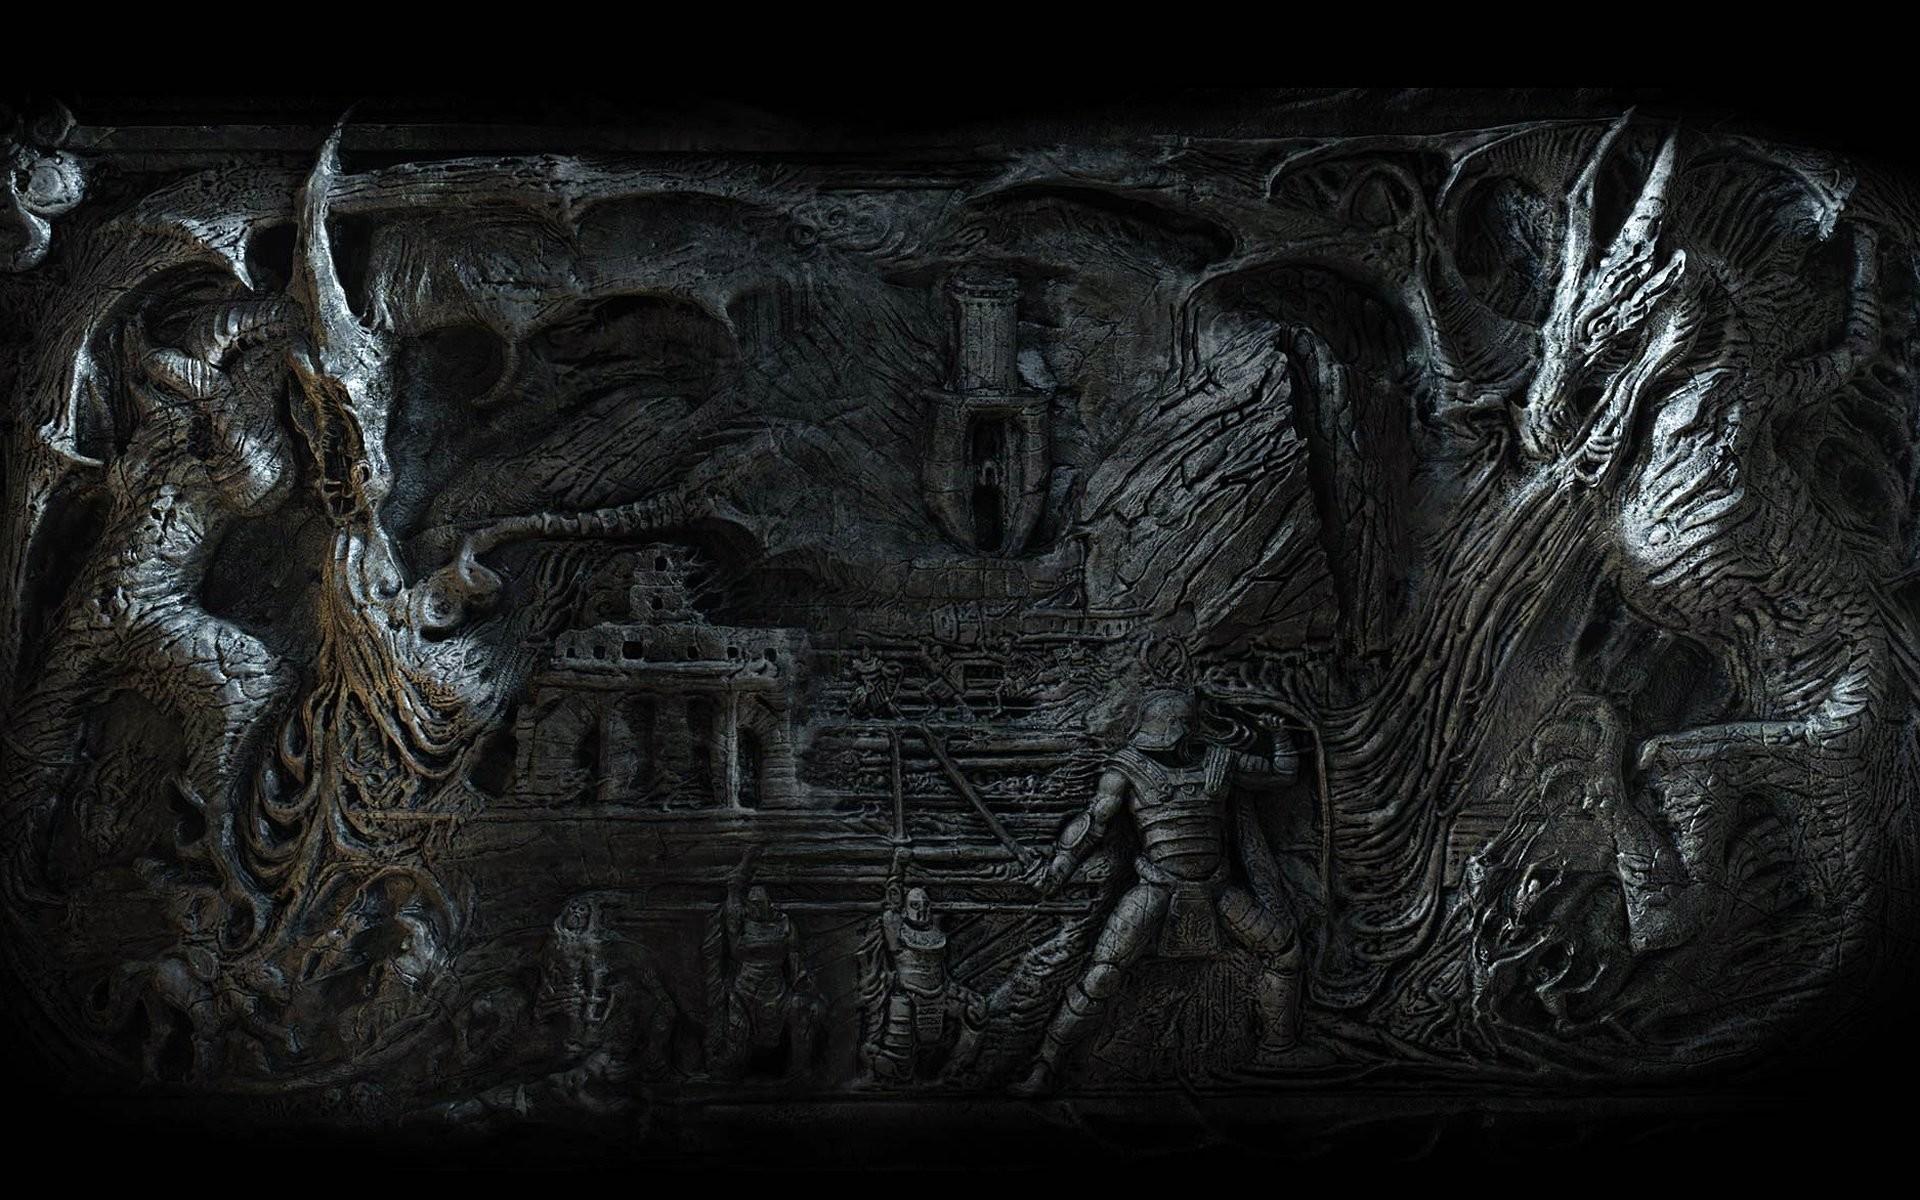 Elder Scrolls V: Skyrim wallpapers and stock photos